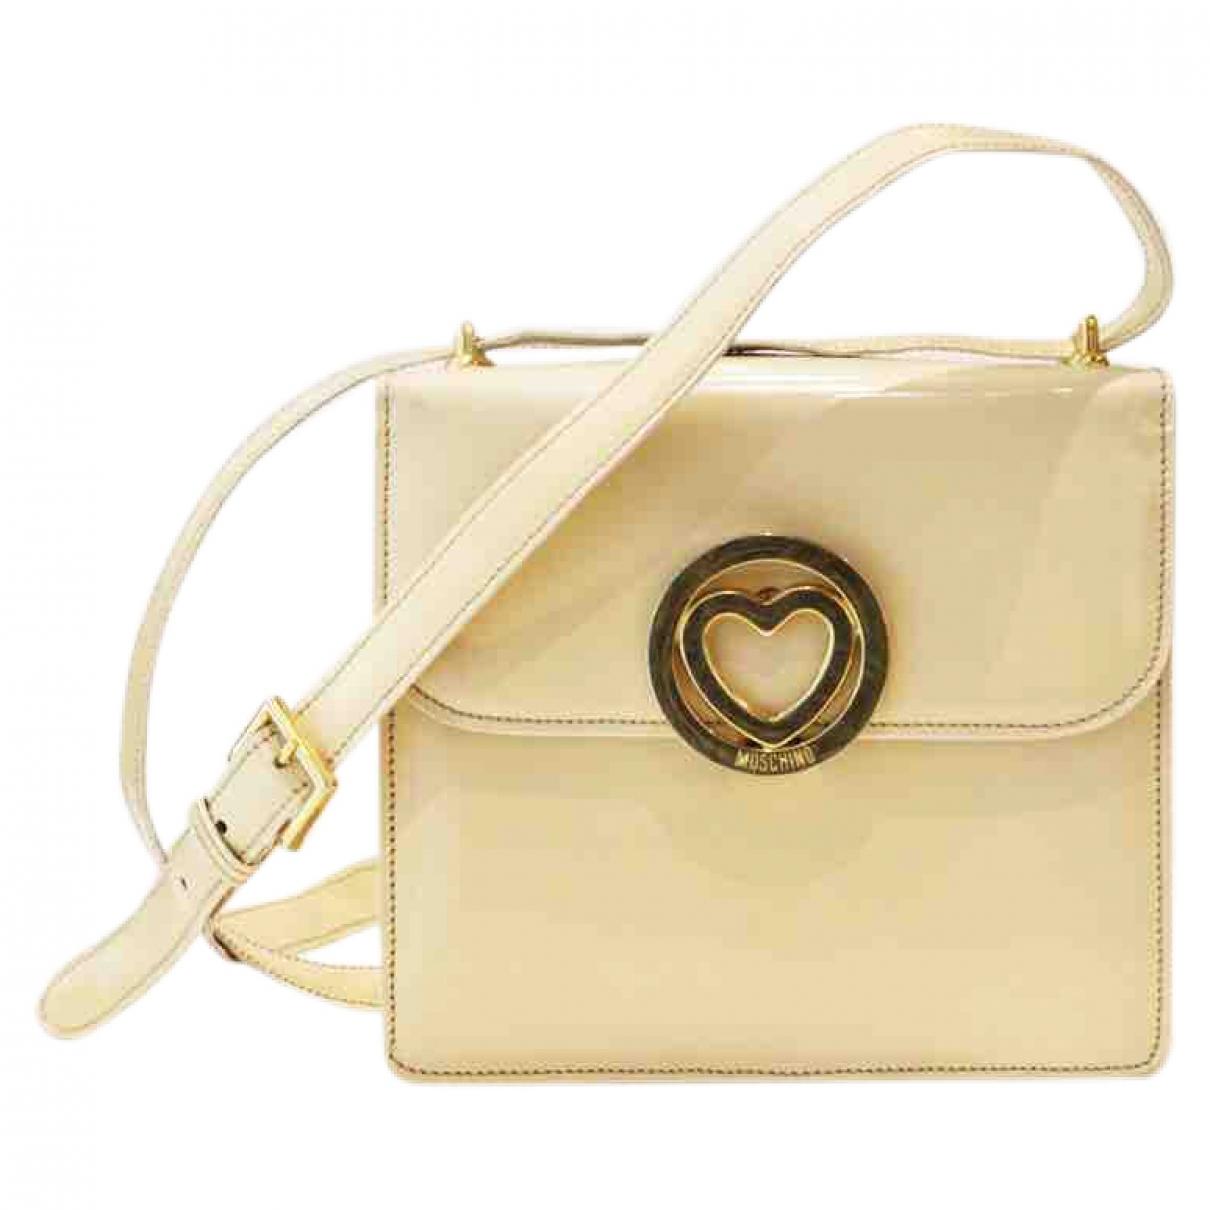 Moschino \N White Patent leather handbag for Women \N